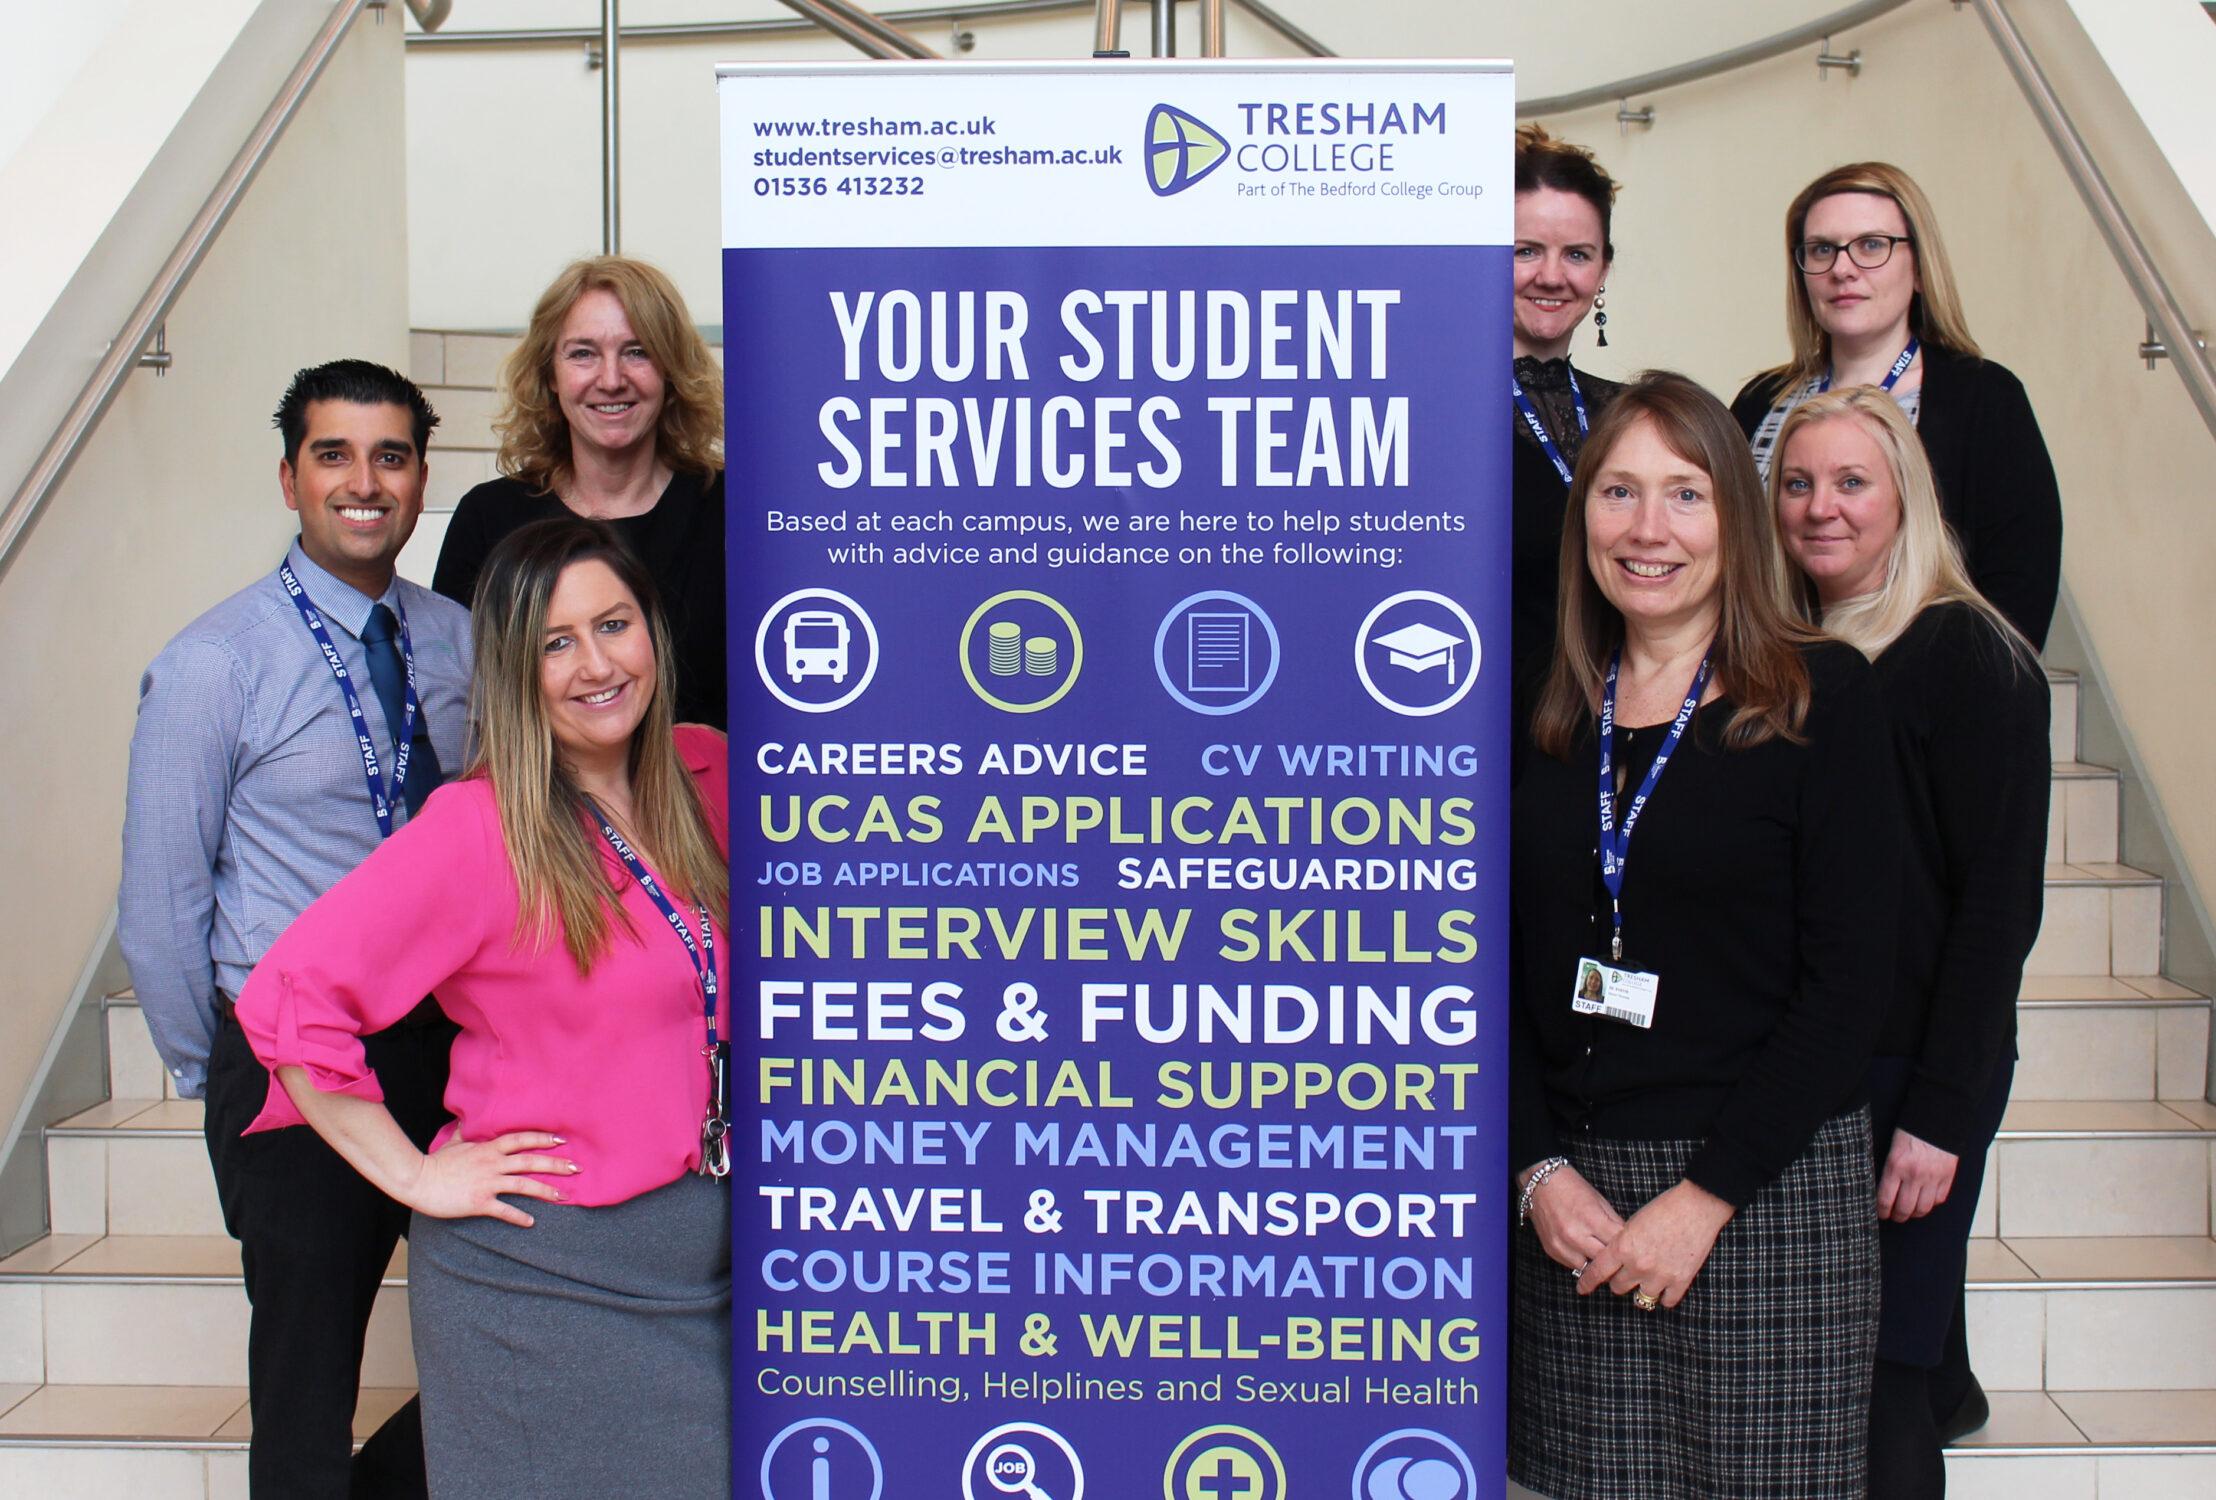 Tresham College Student Services Team